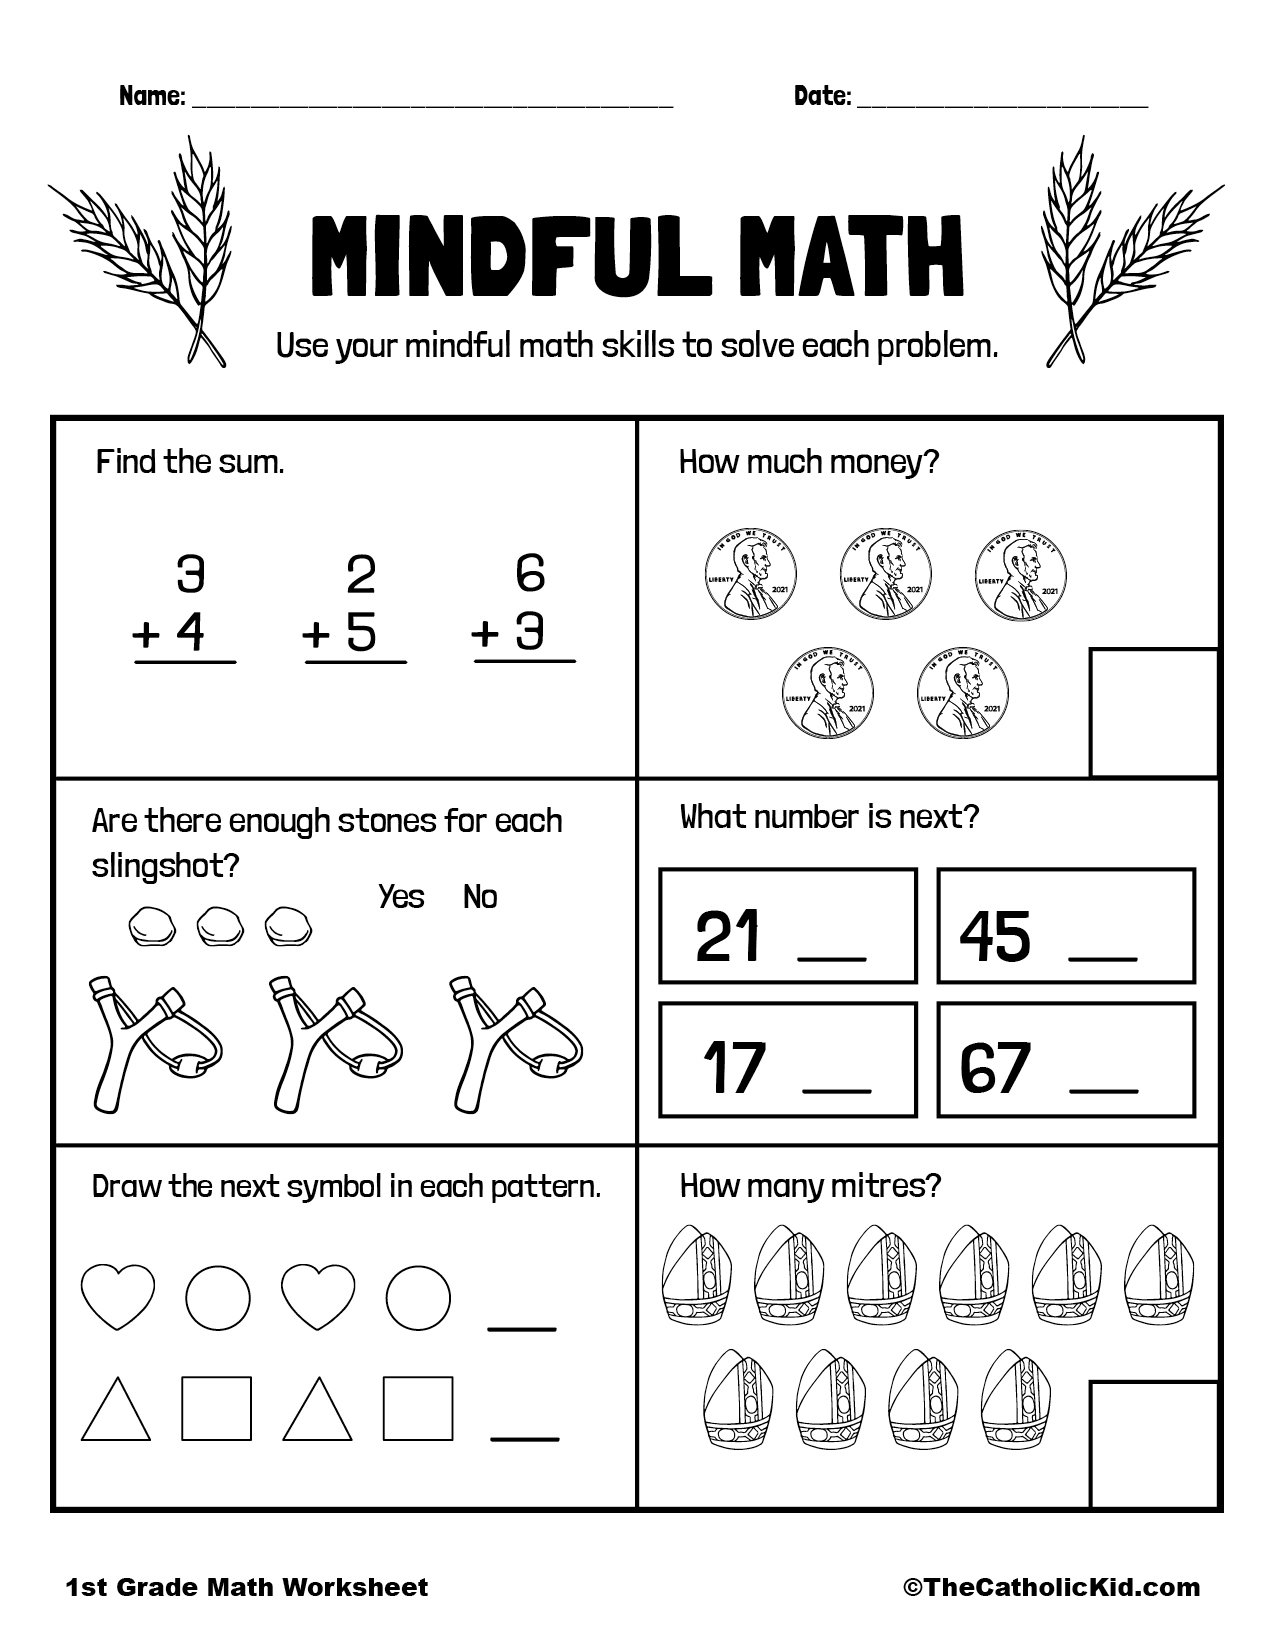 Mental Math Skills - 1st Grade Math Worksheet Catholic